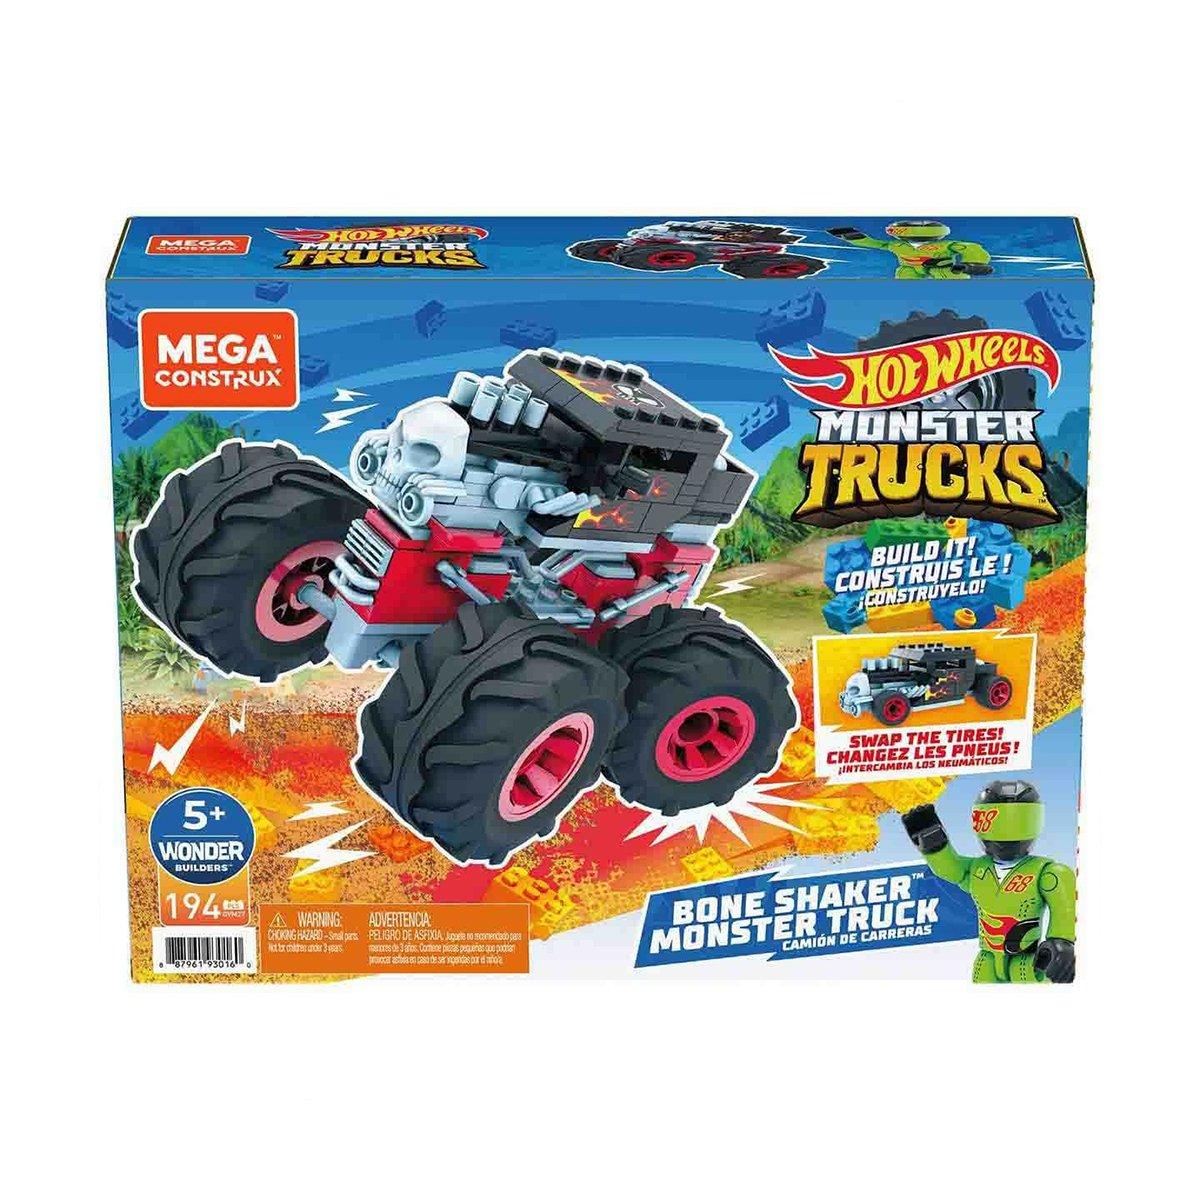 Masinuta Hot Wheels, Megaconstrux, Mini Trucks, GVM27